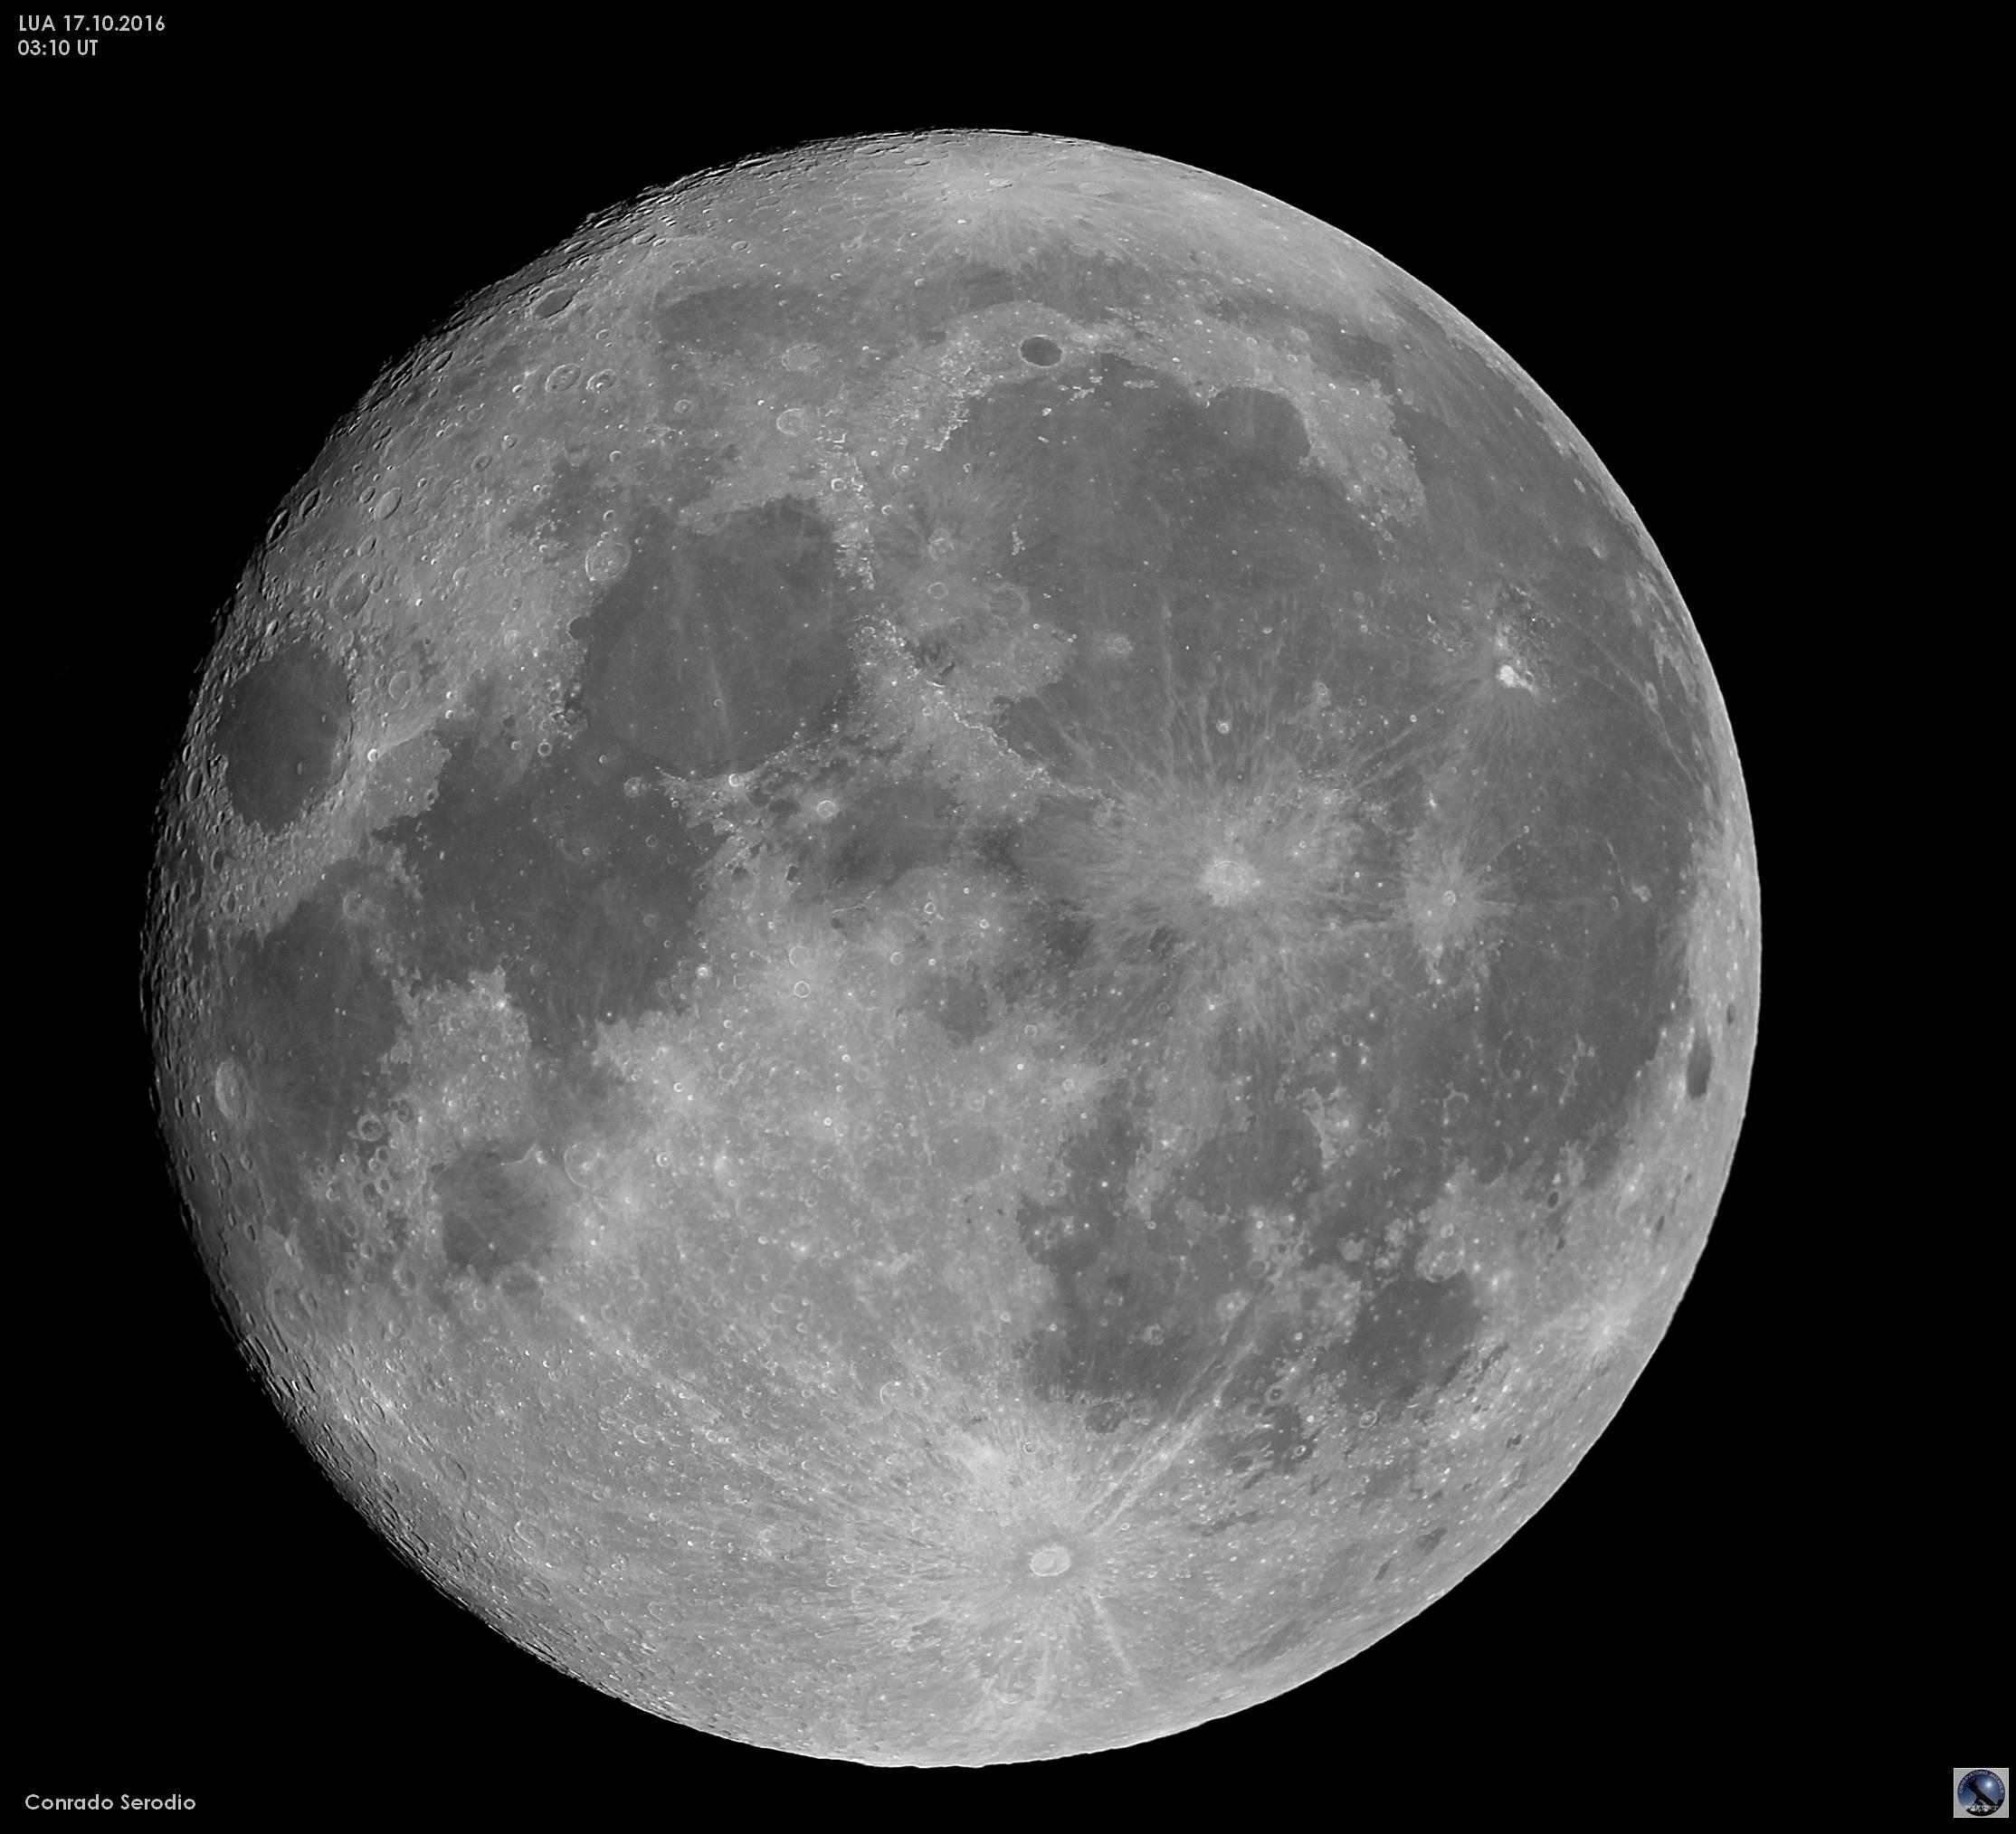 Super Lua em 17 Out 2016